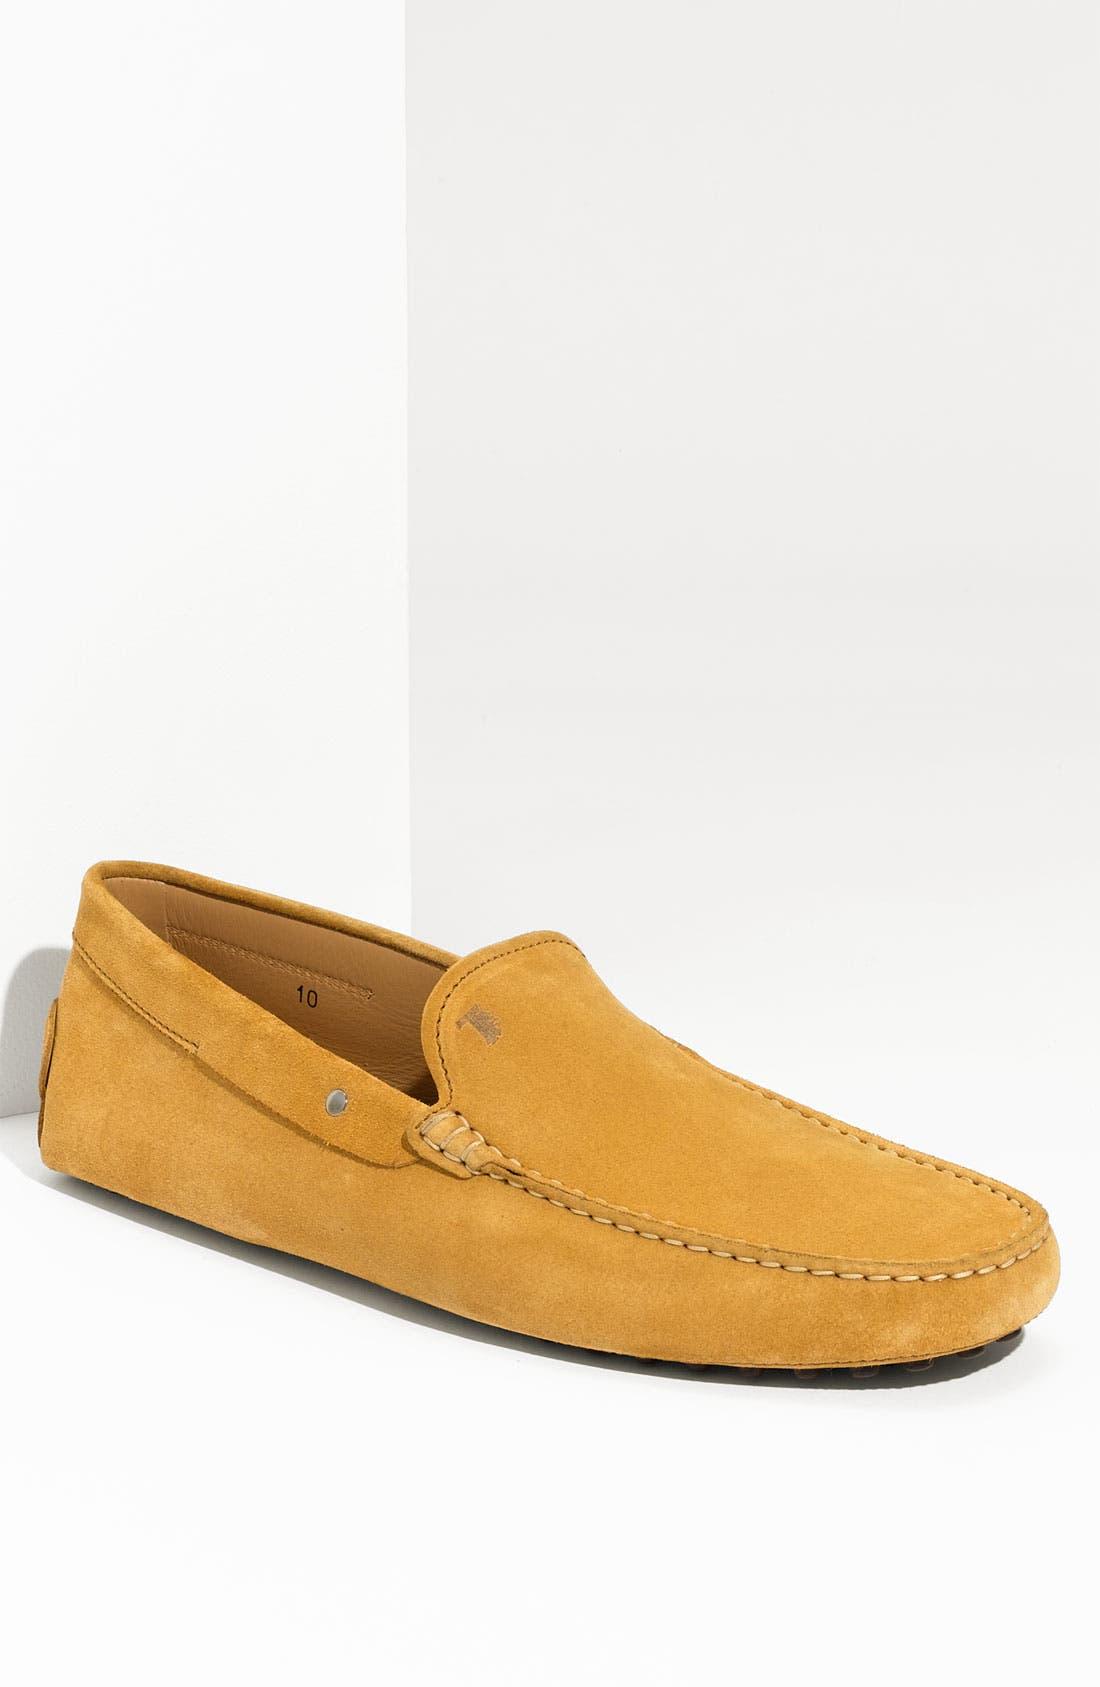 Alternate Image 1 Selected - Tod's 'Gommini' Venetian Driving Shoe